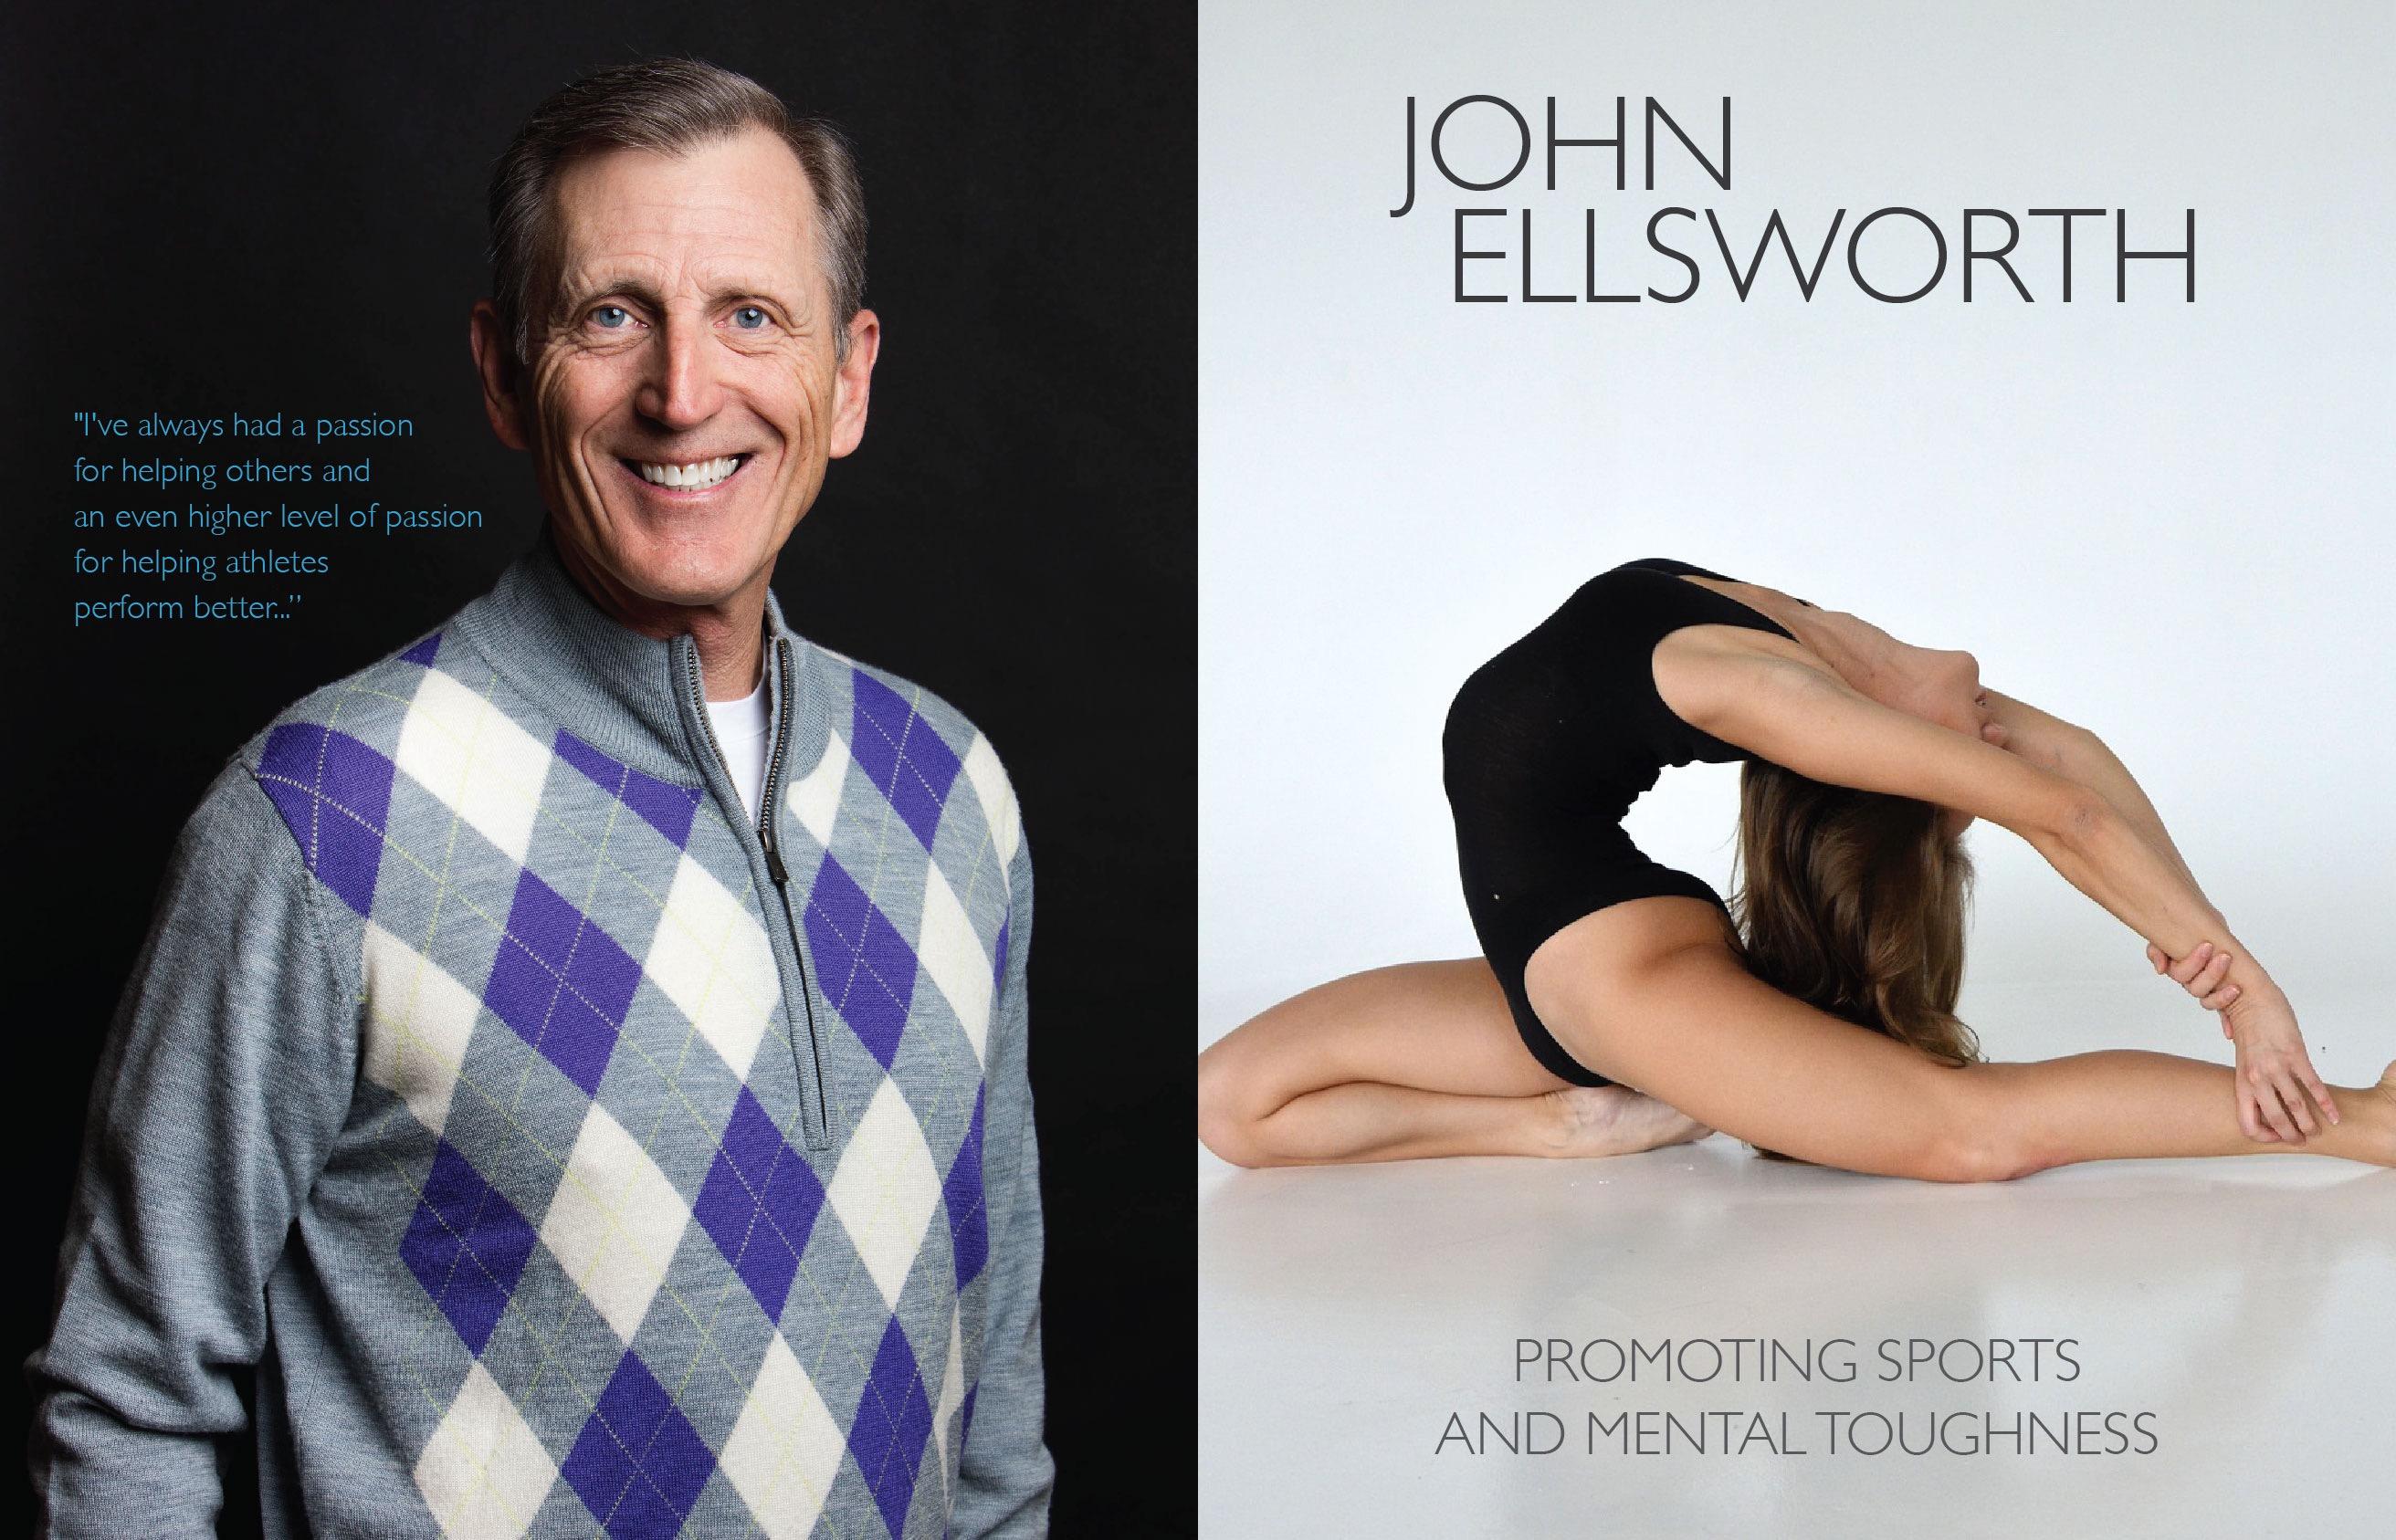 John Ellsworth 01-02